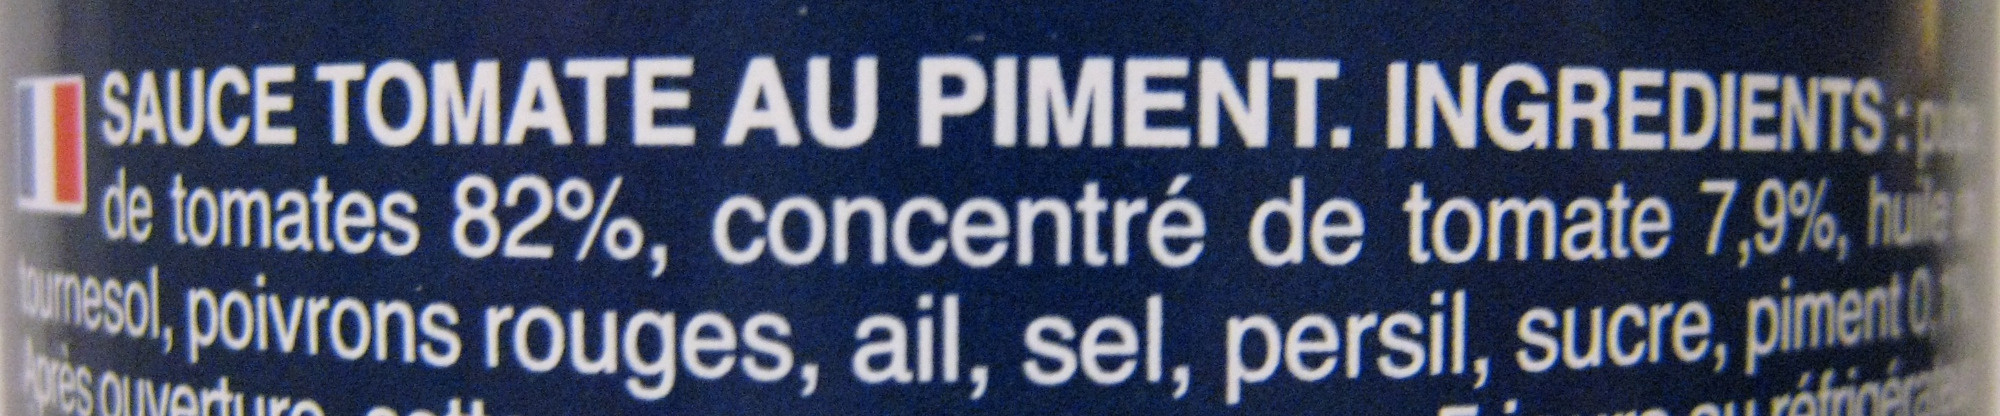 Sauce arrabbiata - Ingredienti - fr